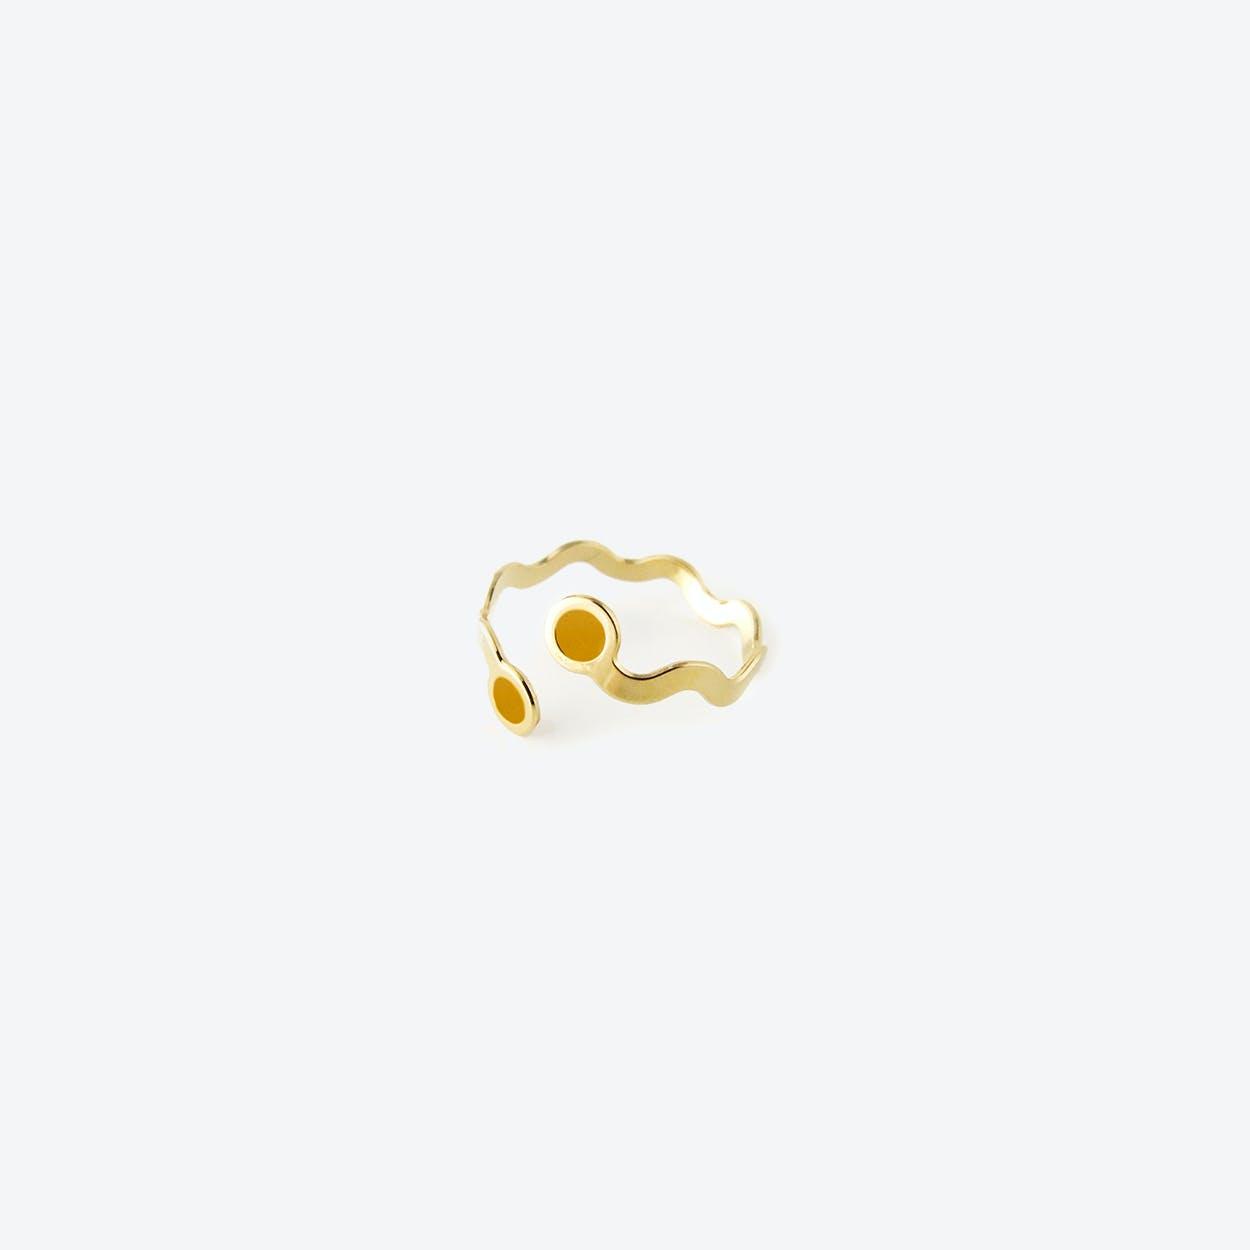 Wavy Gold Ring - Saffron